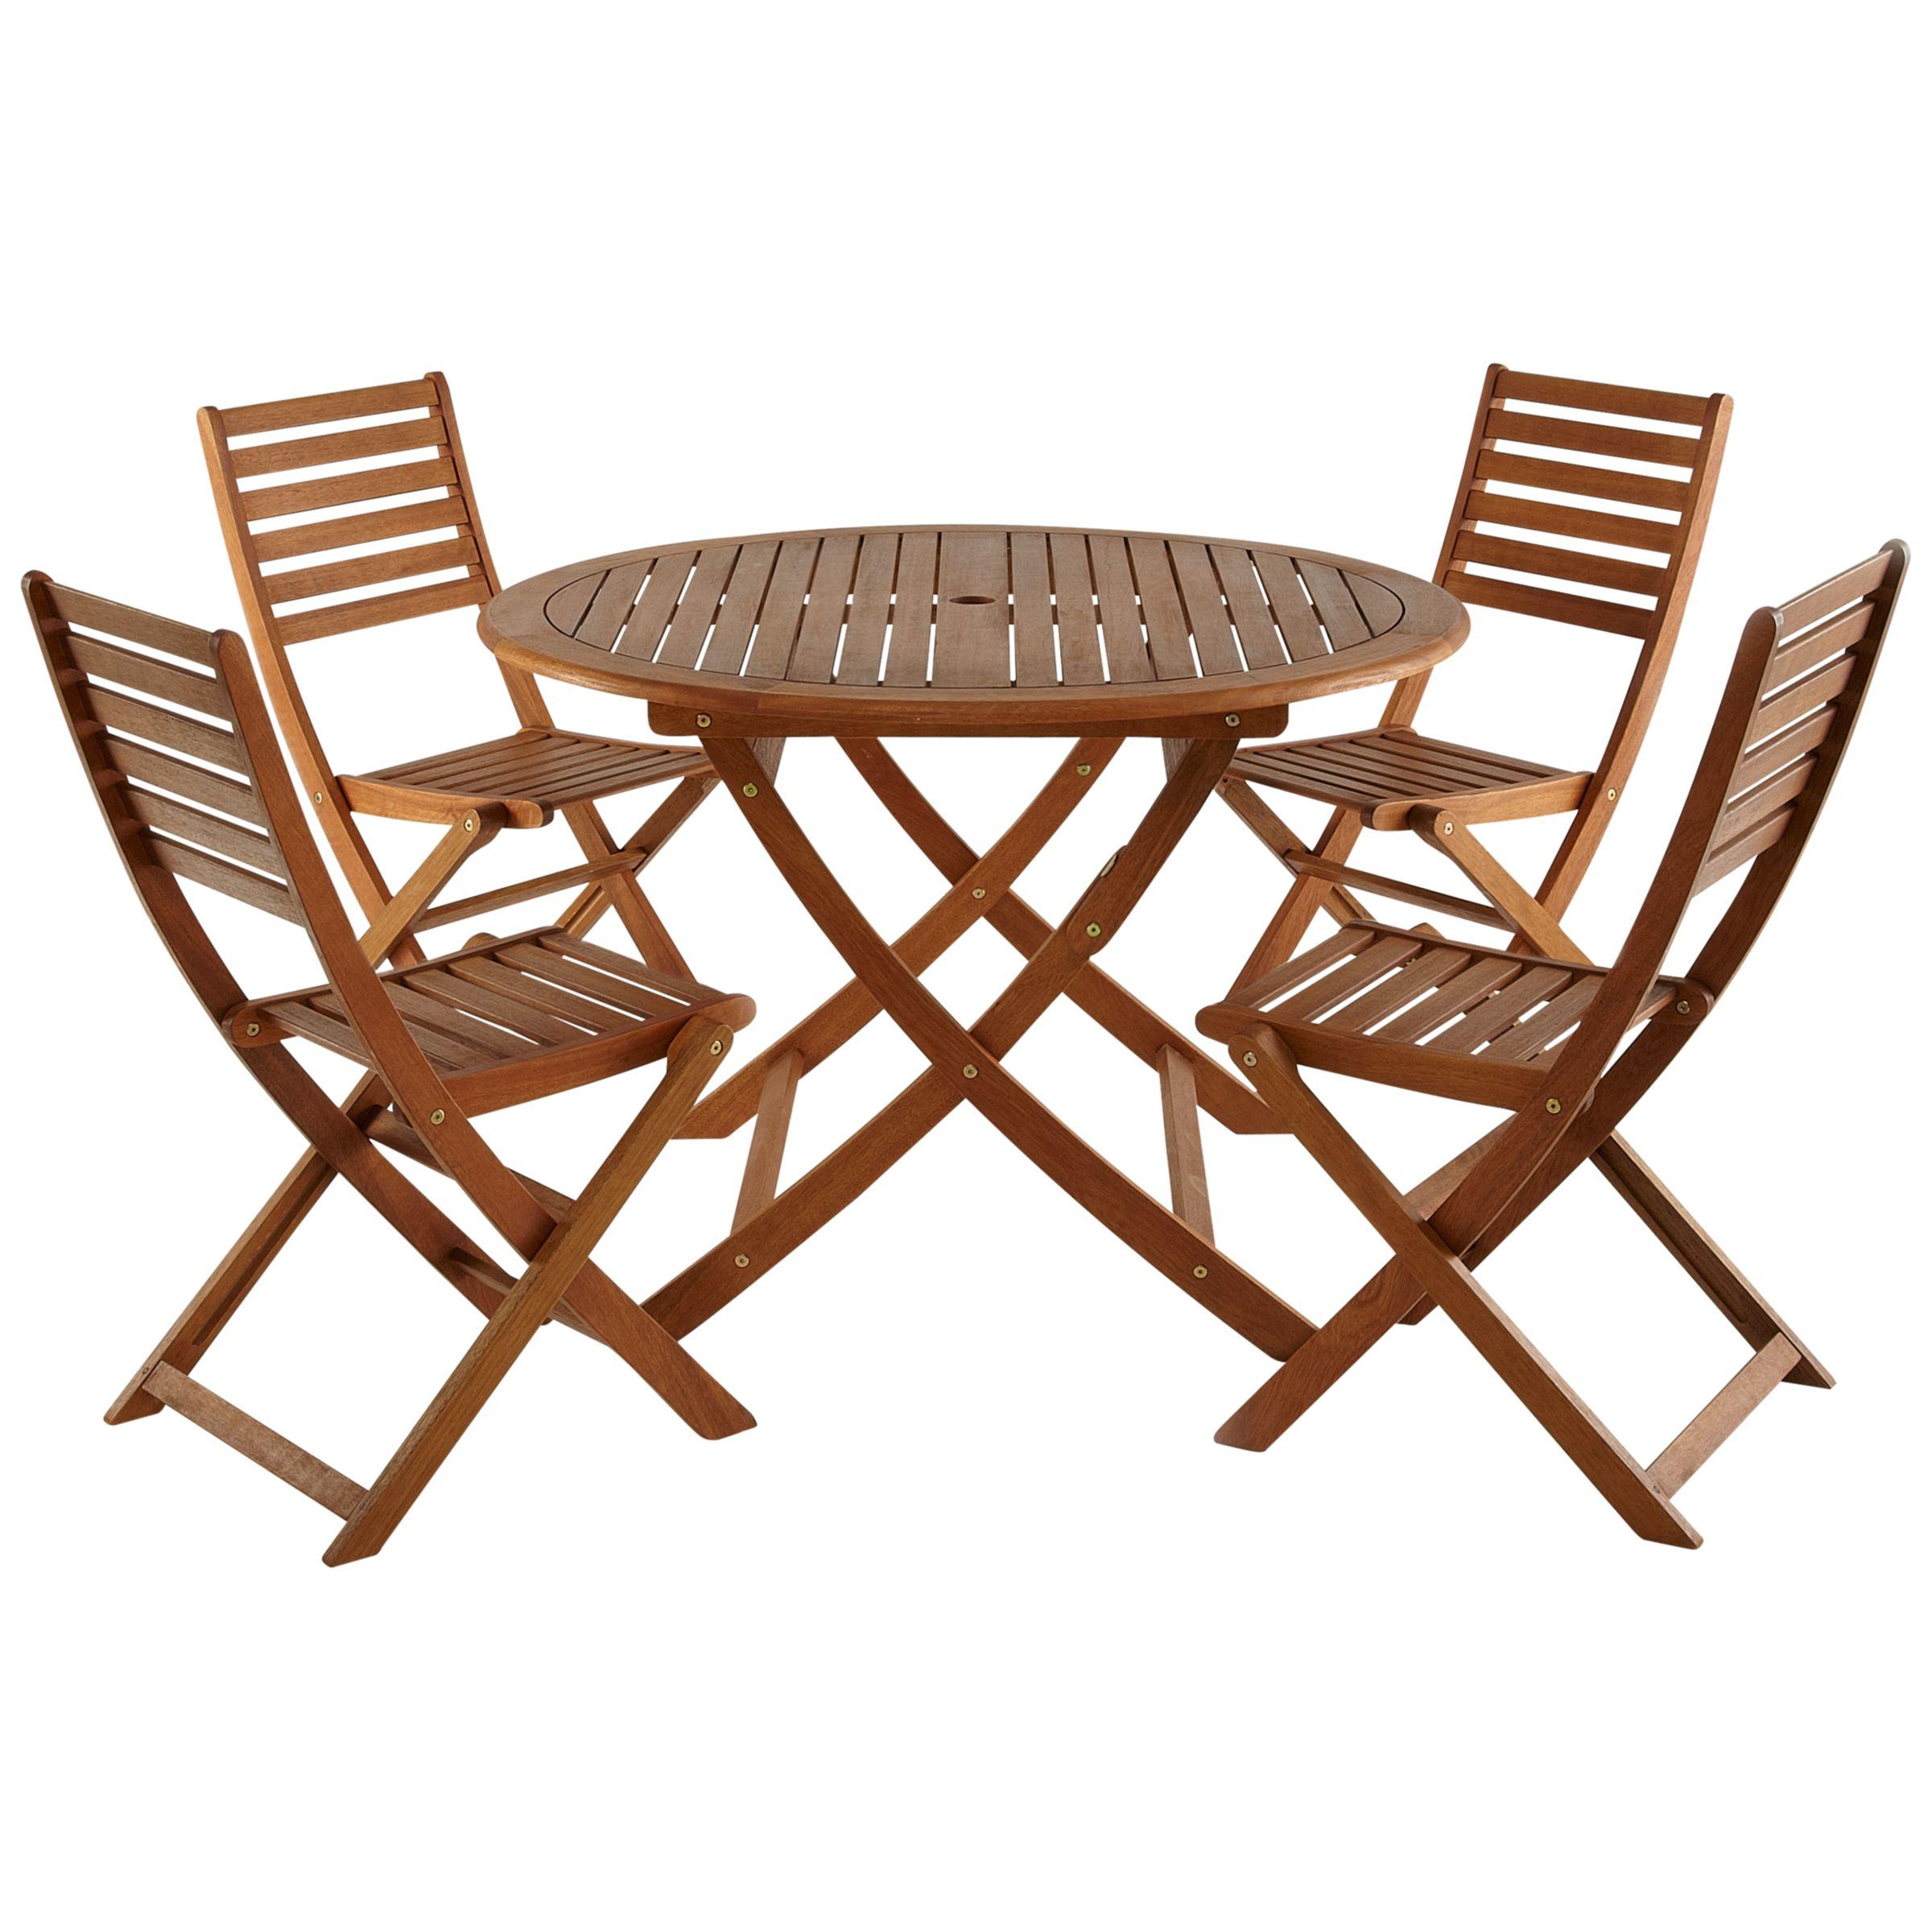 John Lewis Naples 4 Seater Outdoor Dining Set